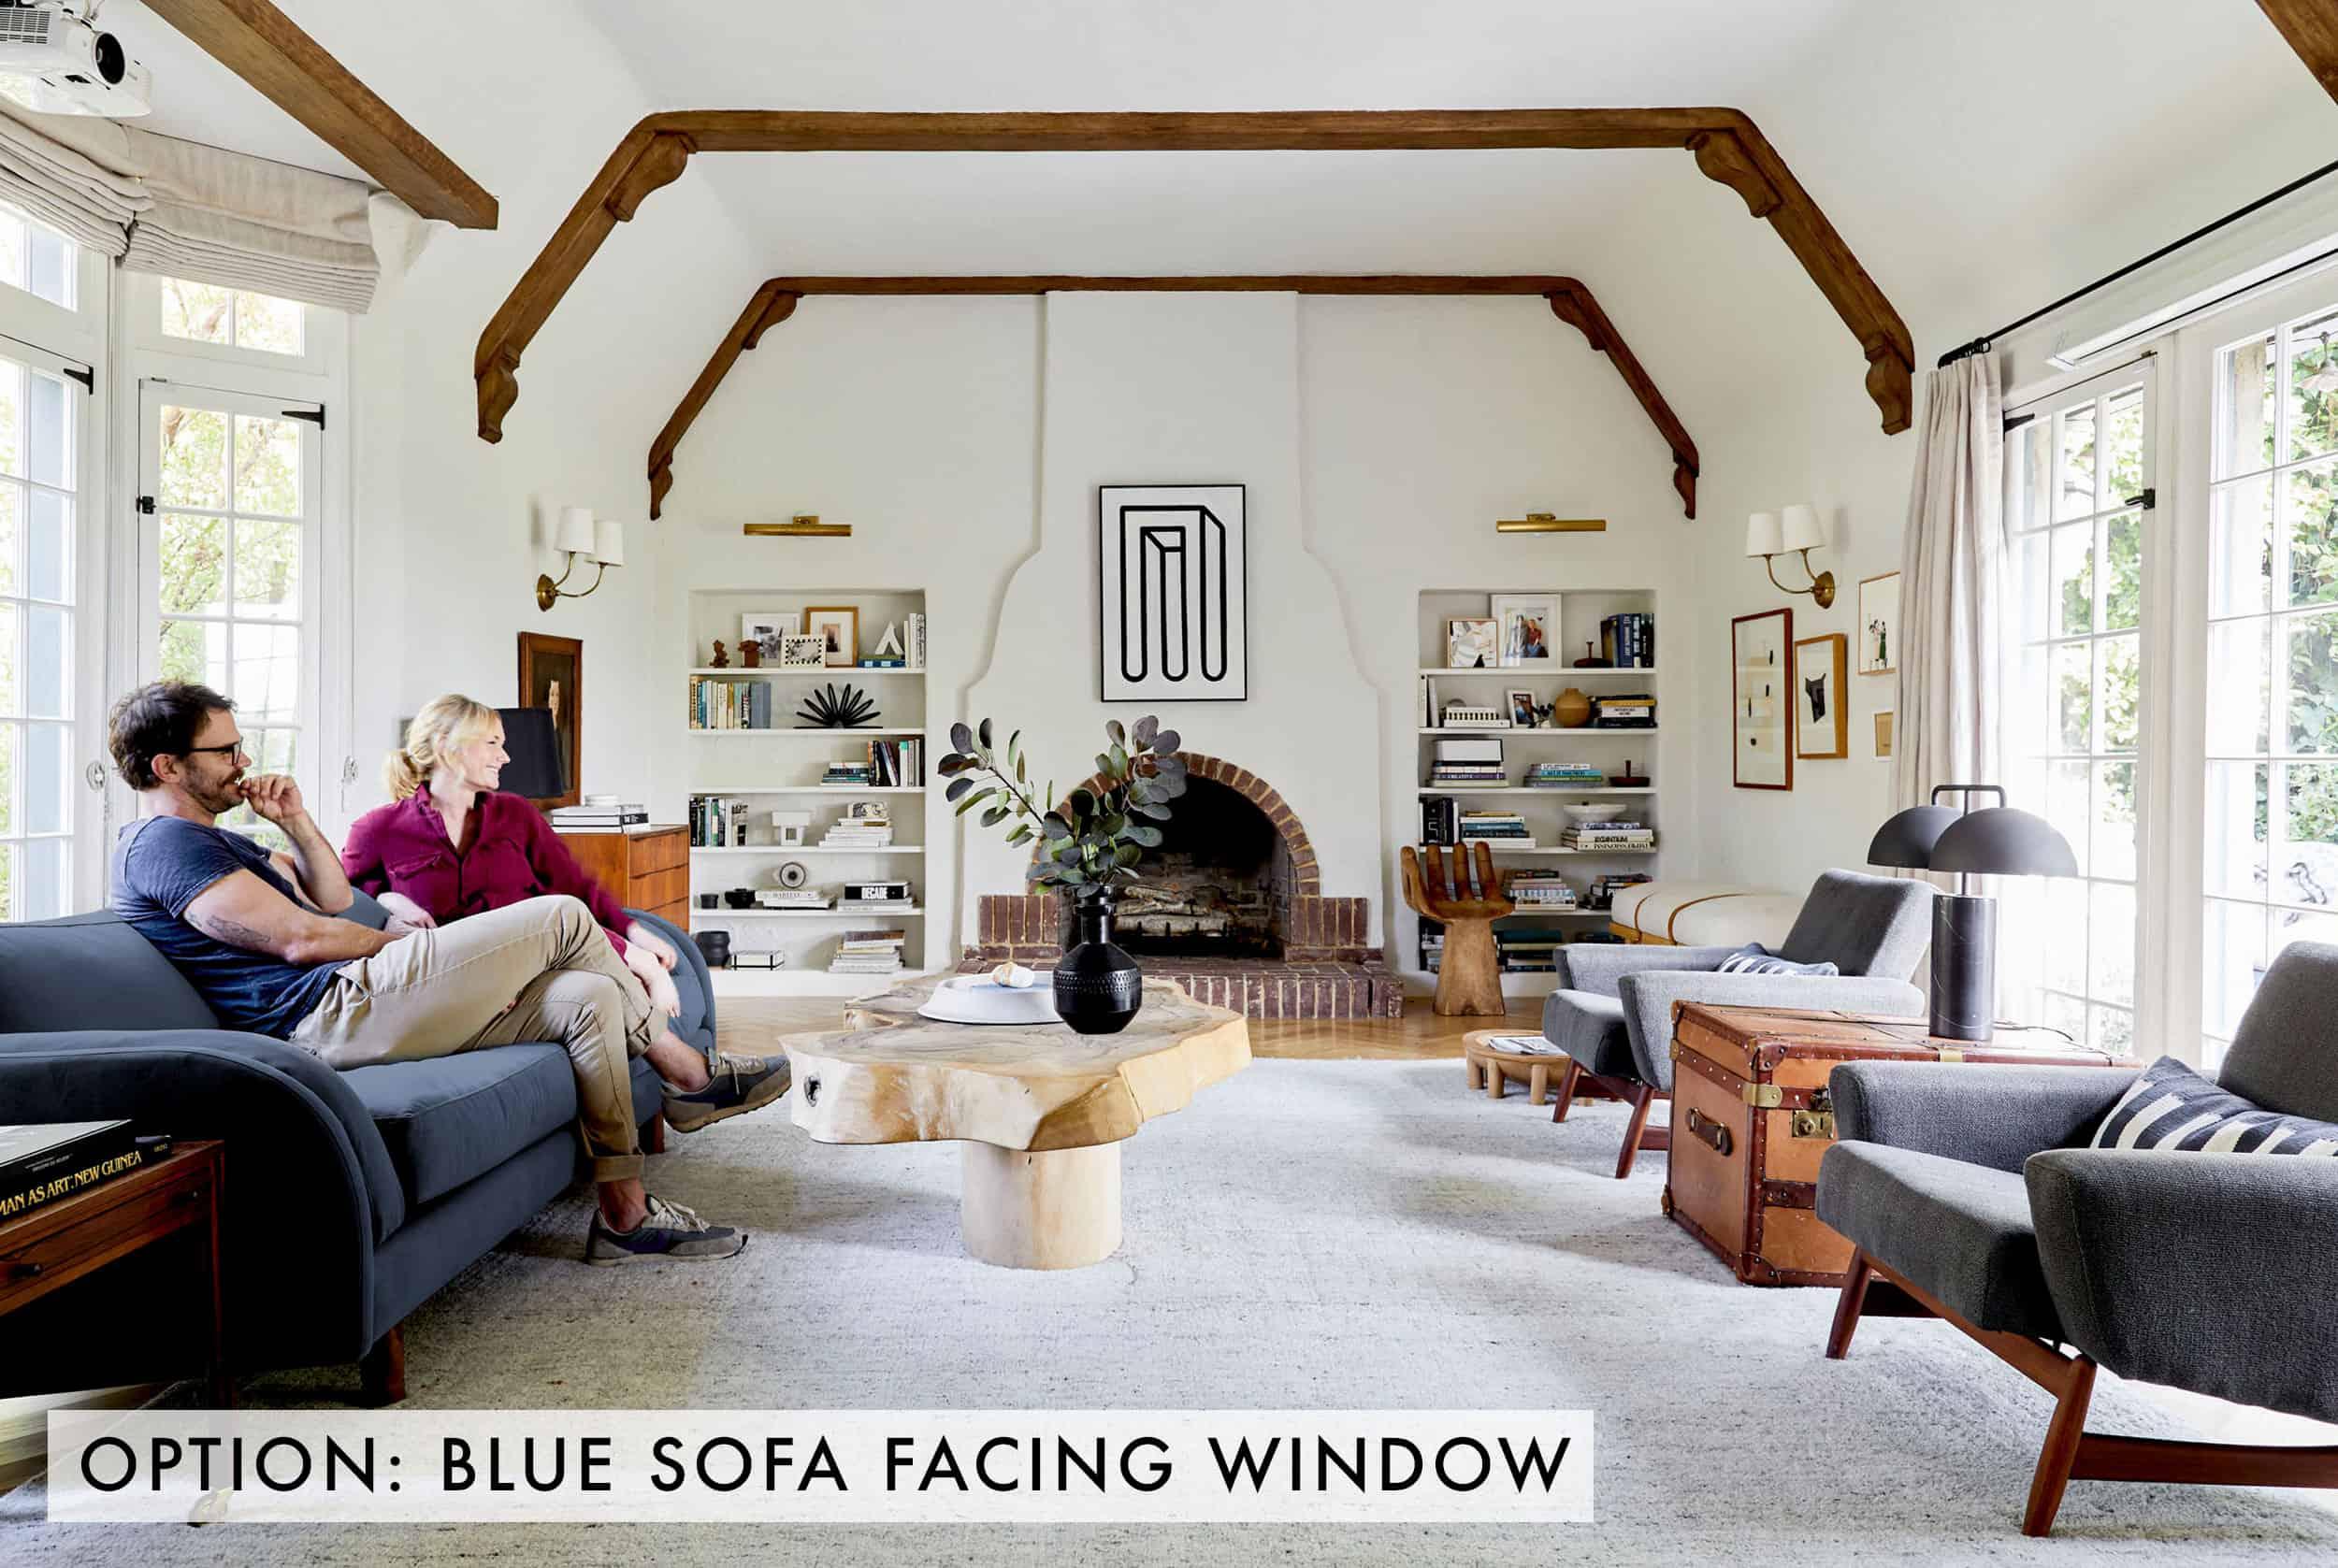 Blue Sofa Facing Window